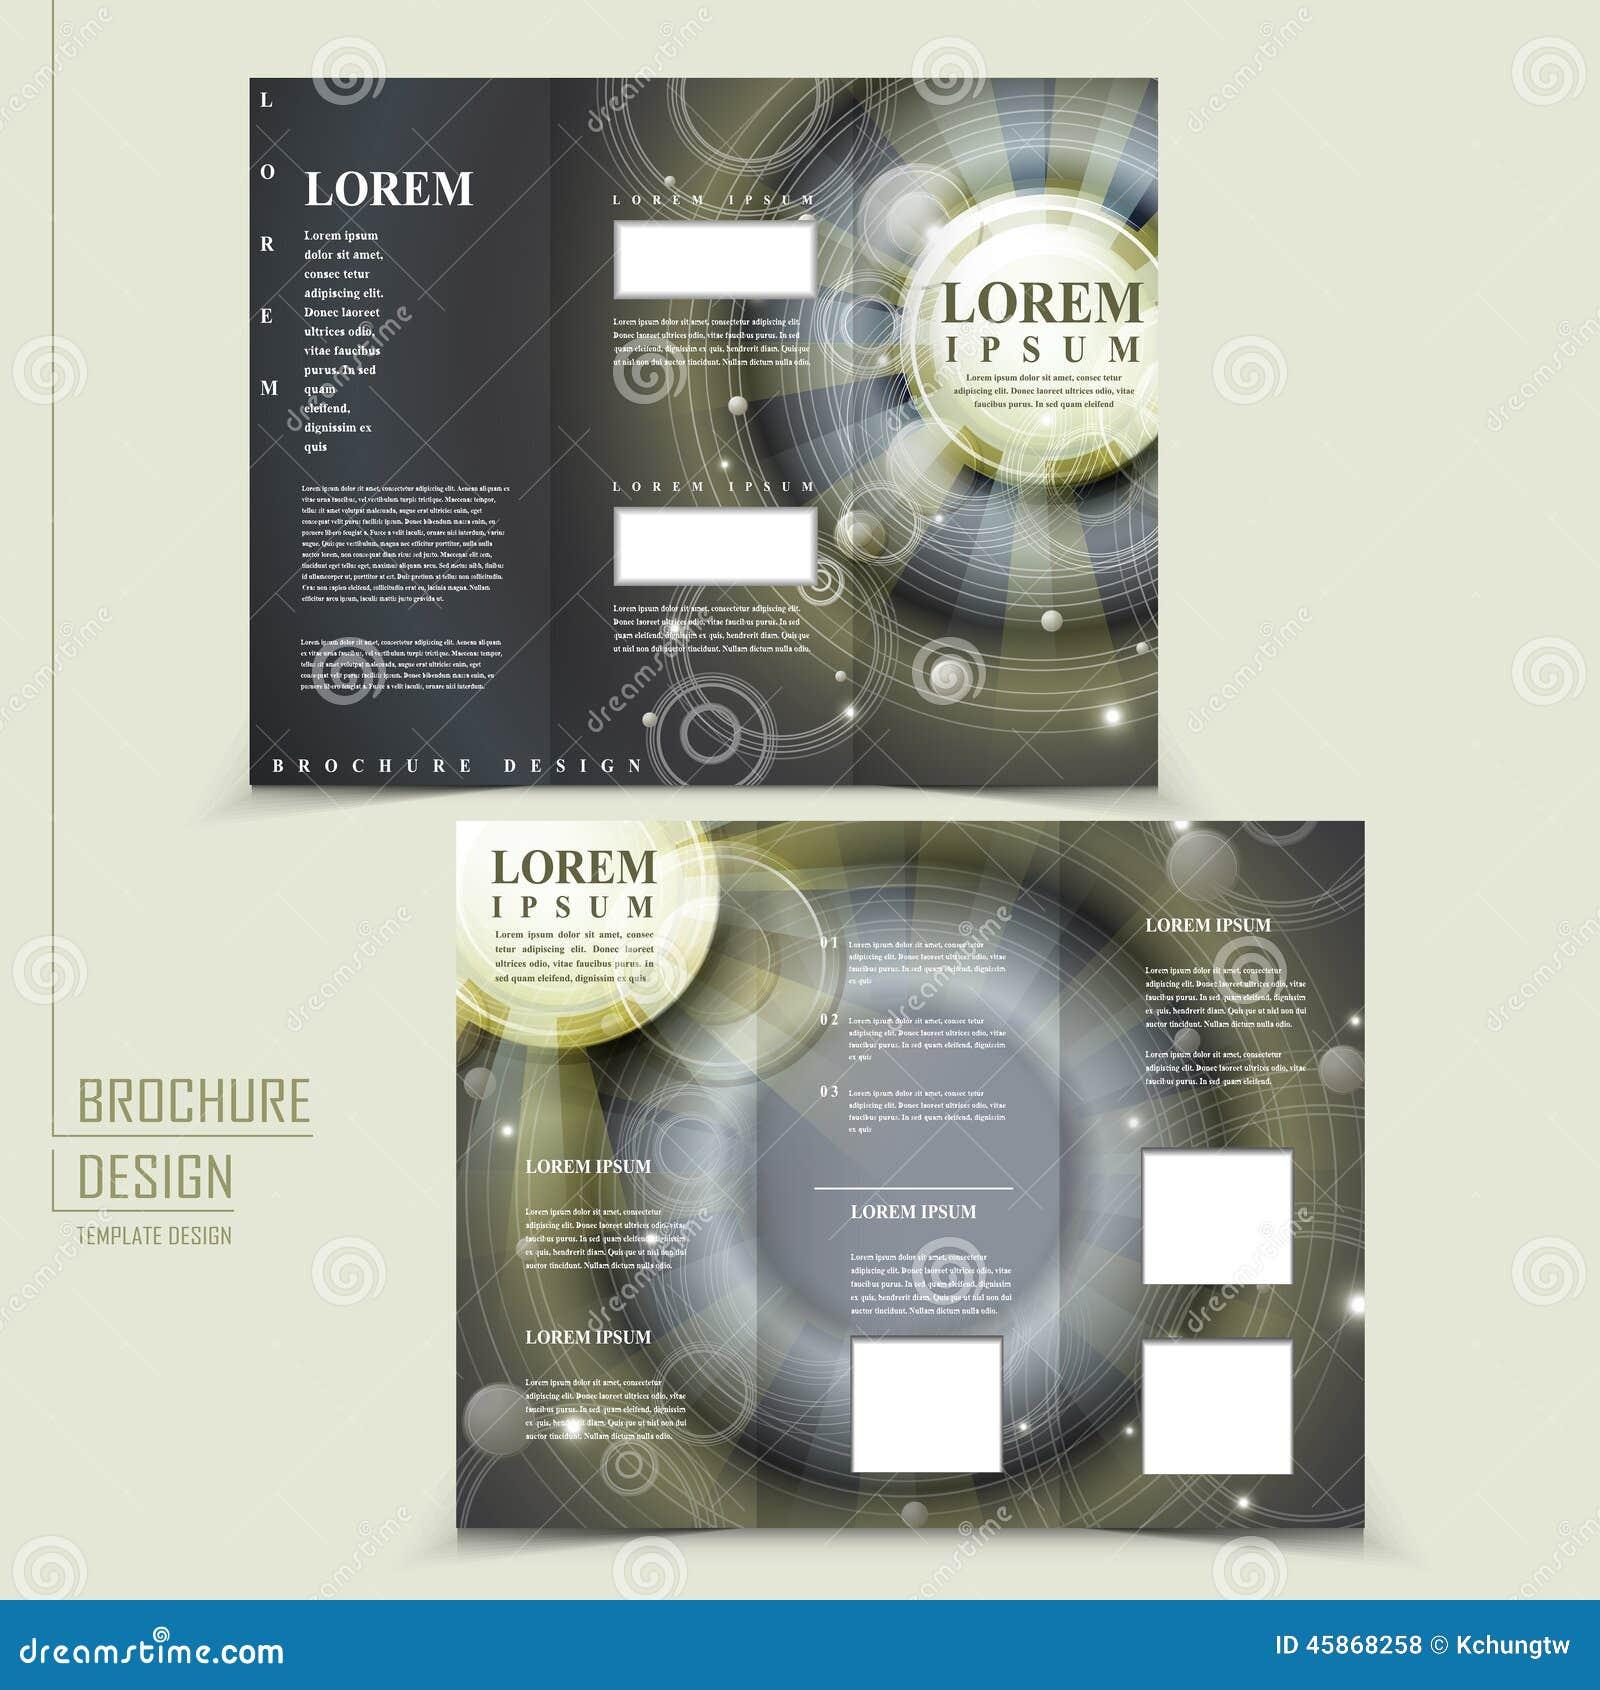 egypt brochure templates - abstract egypt style design for tri fold brochure stock